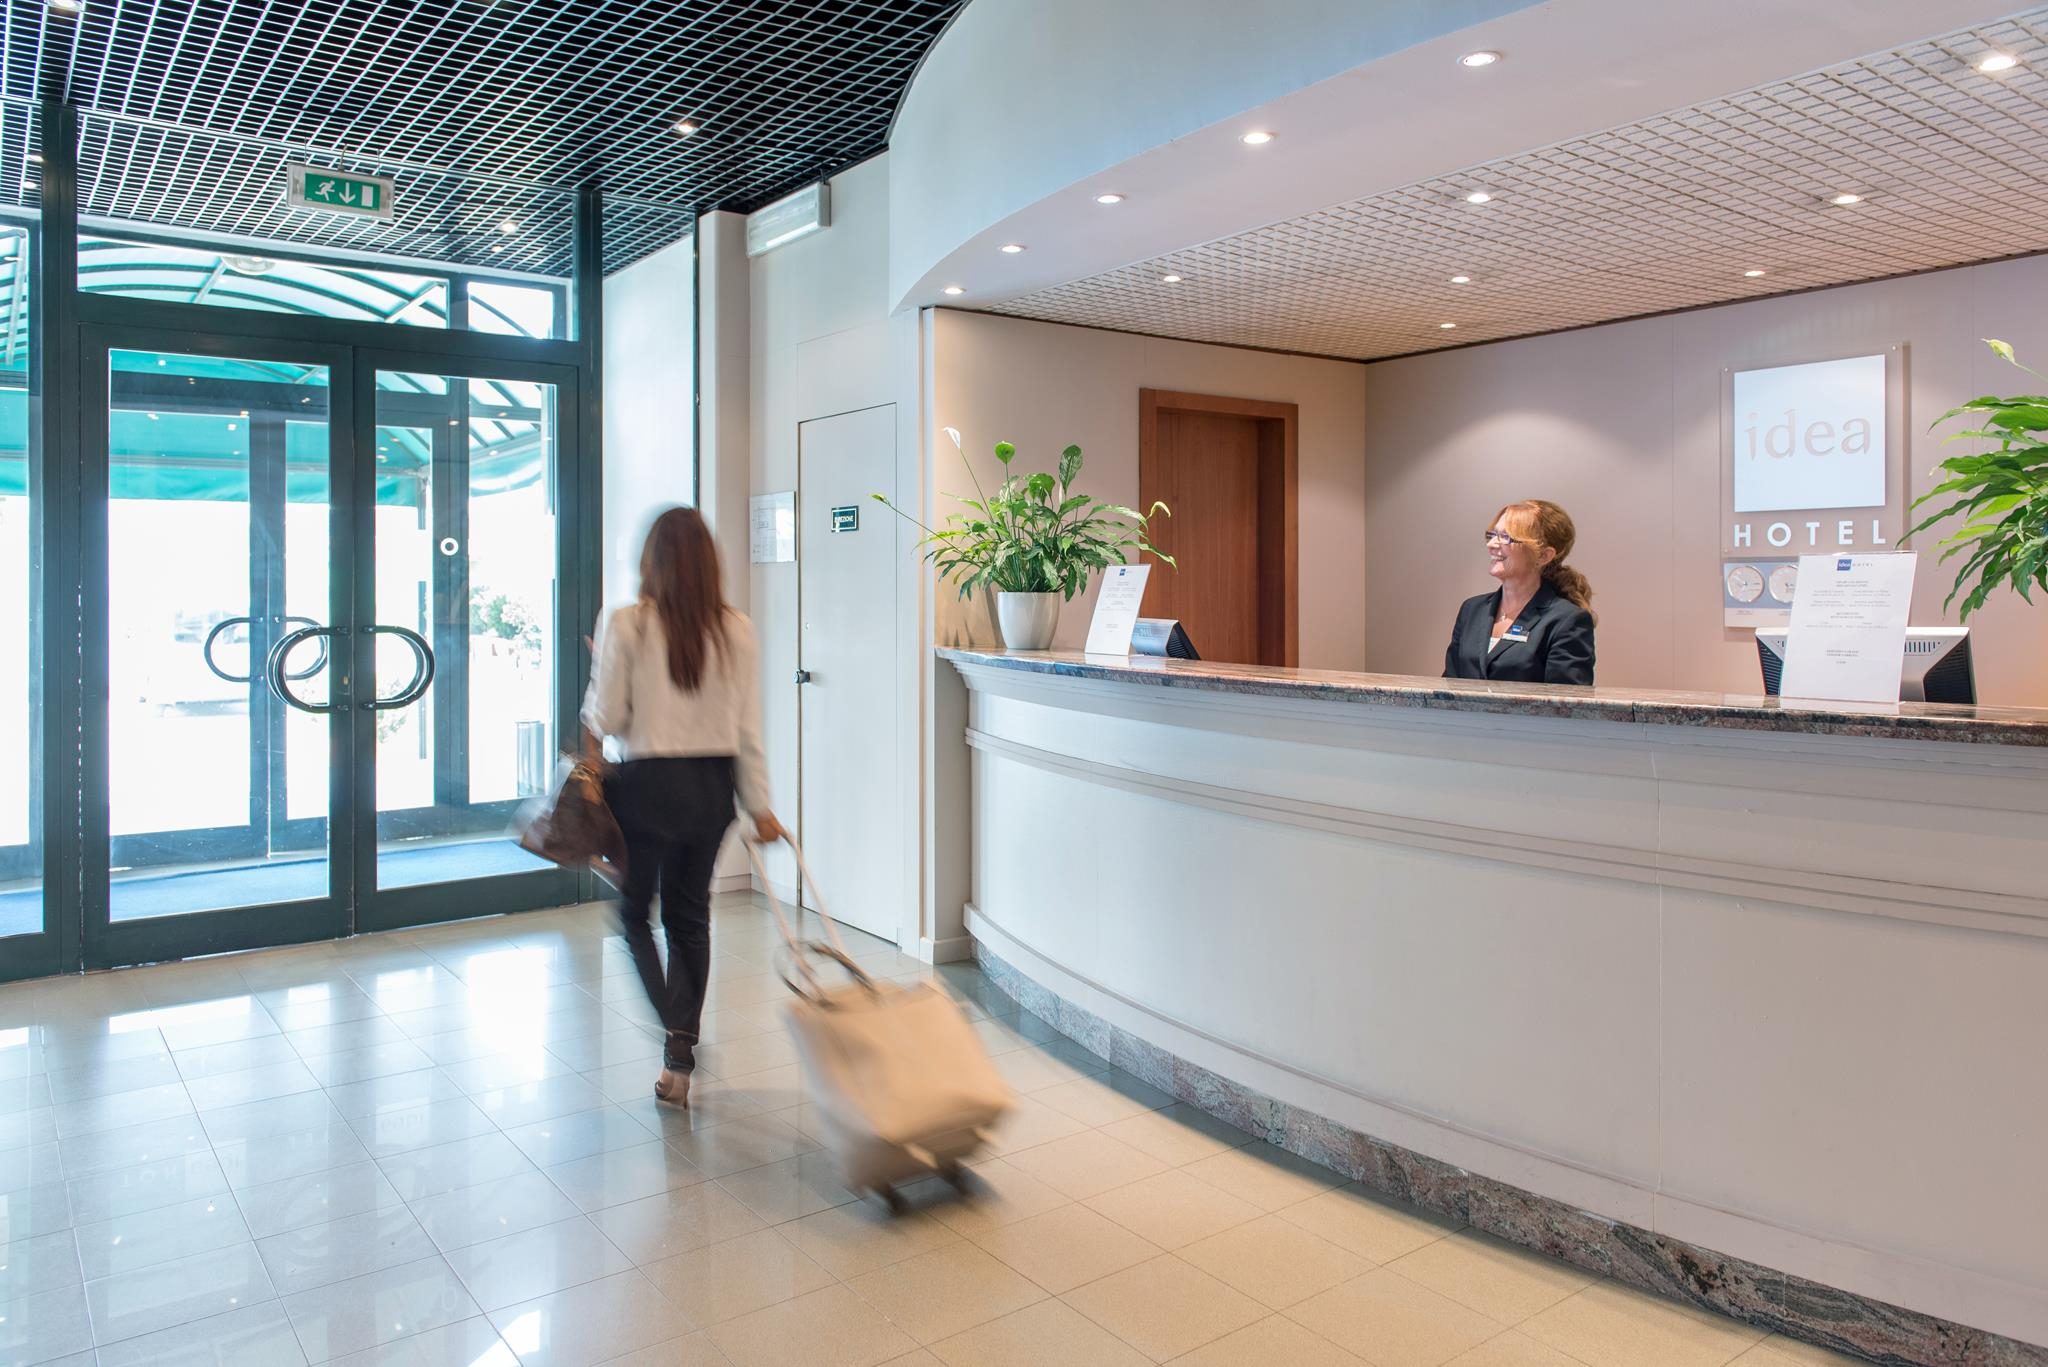 Hall Idea Hotel Piacenza